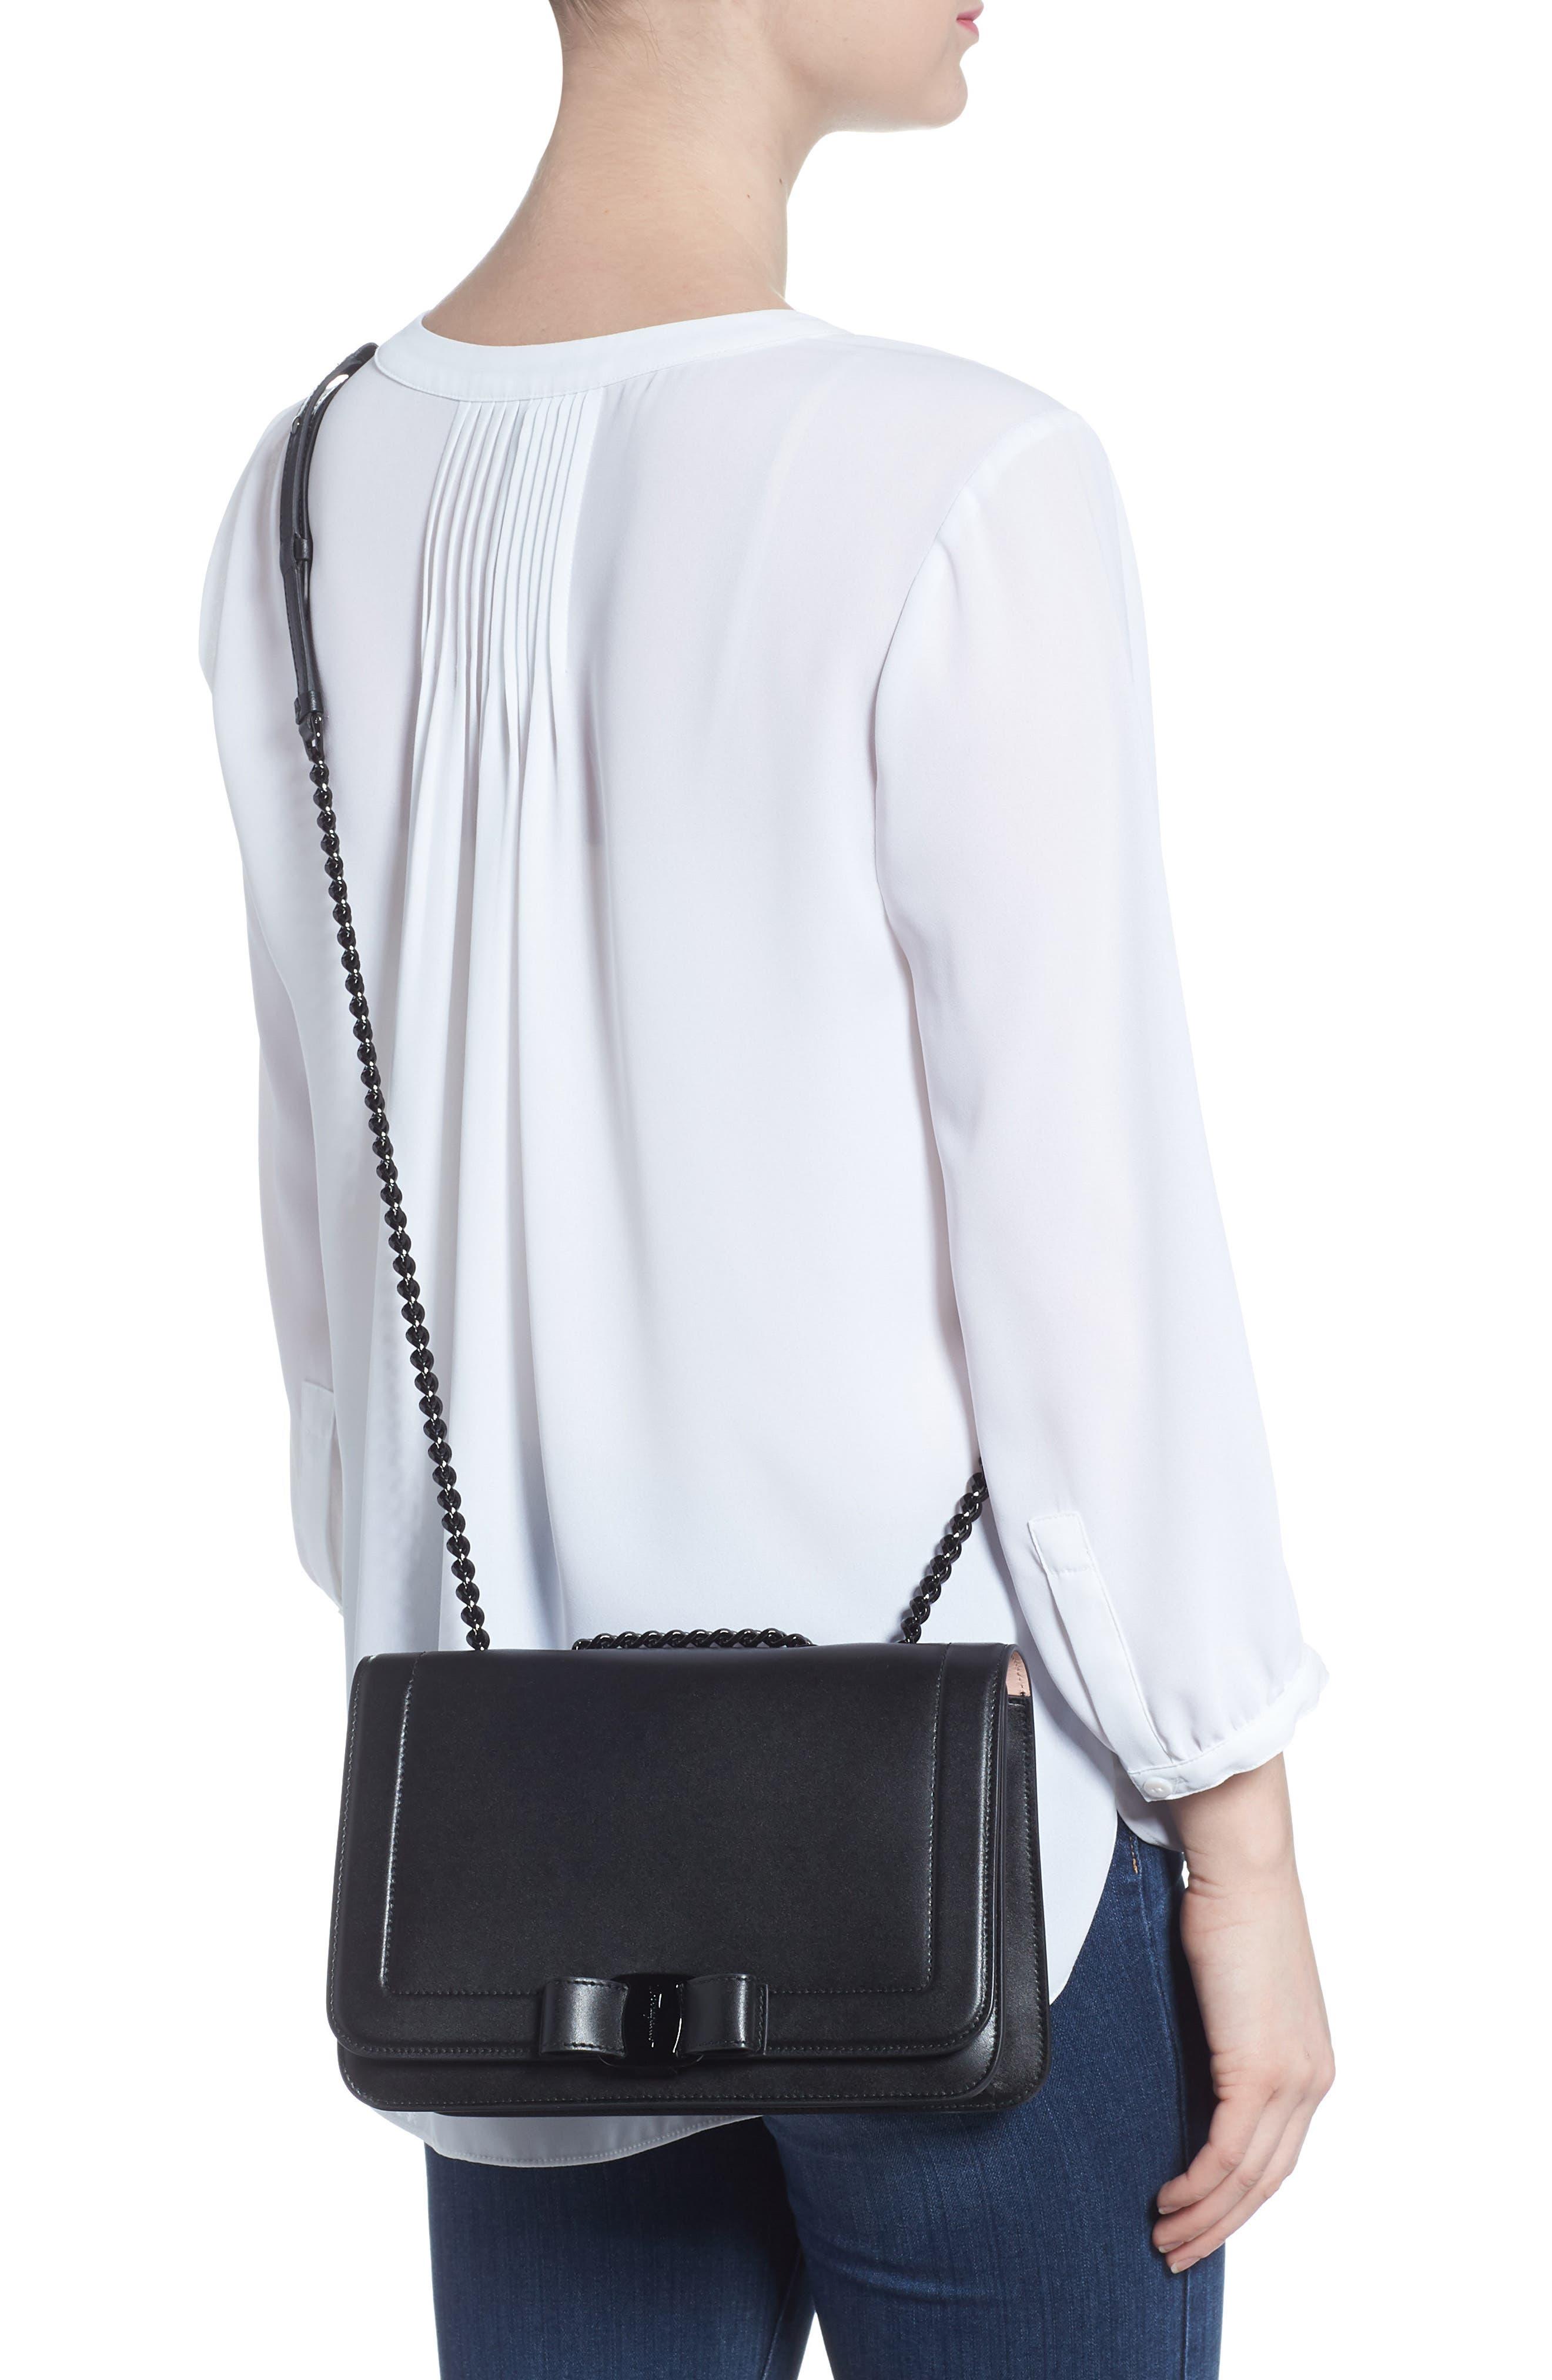 Vara Leather Crossbody Bag,                             Alternate thumbnail 2, color,                             NERO